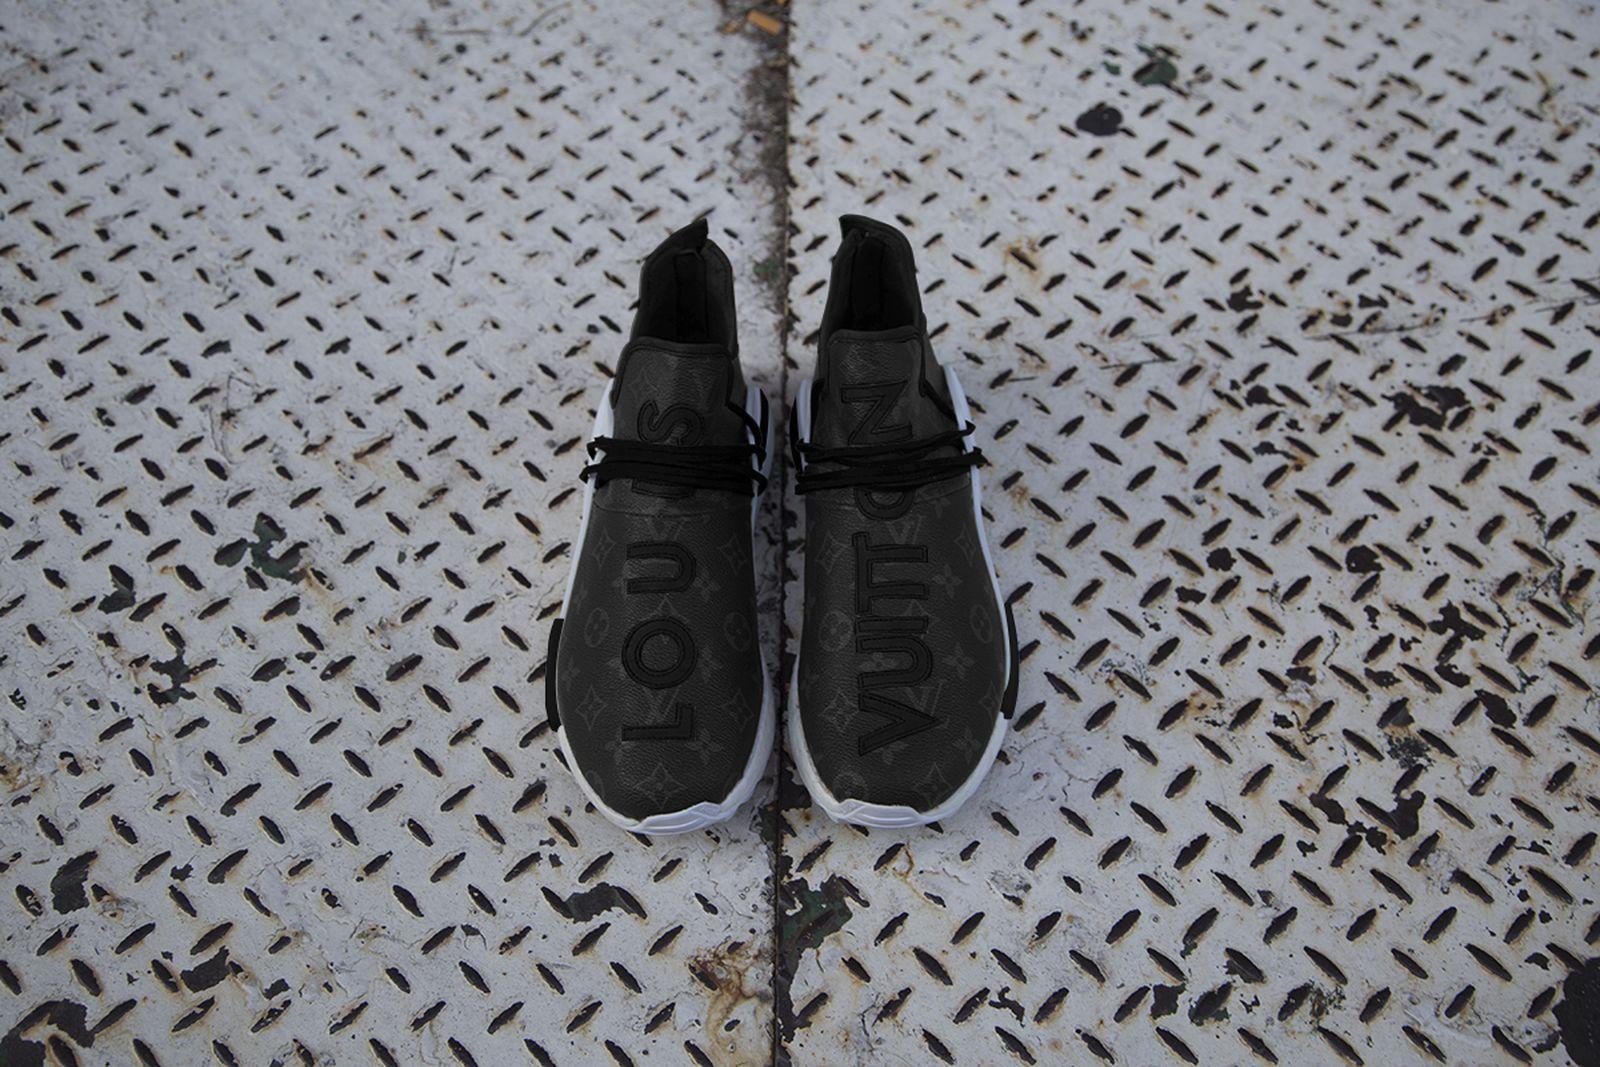 louis vuitton human race nmd custom release date price Adidas Ceeze nmd human race